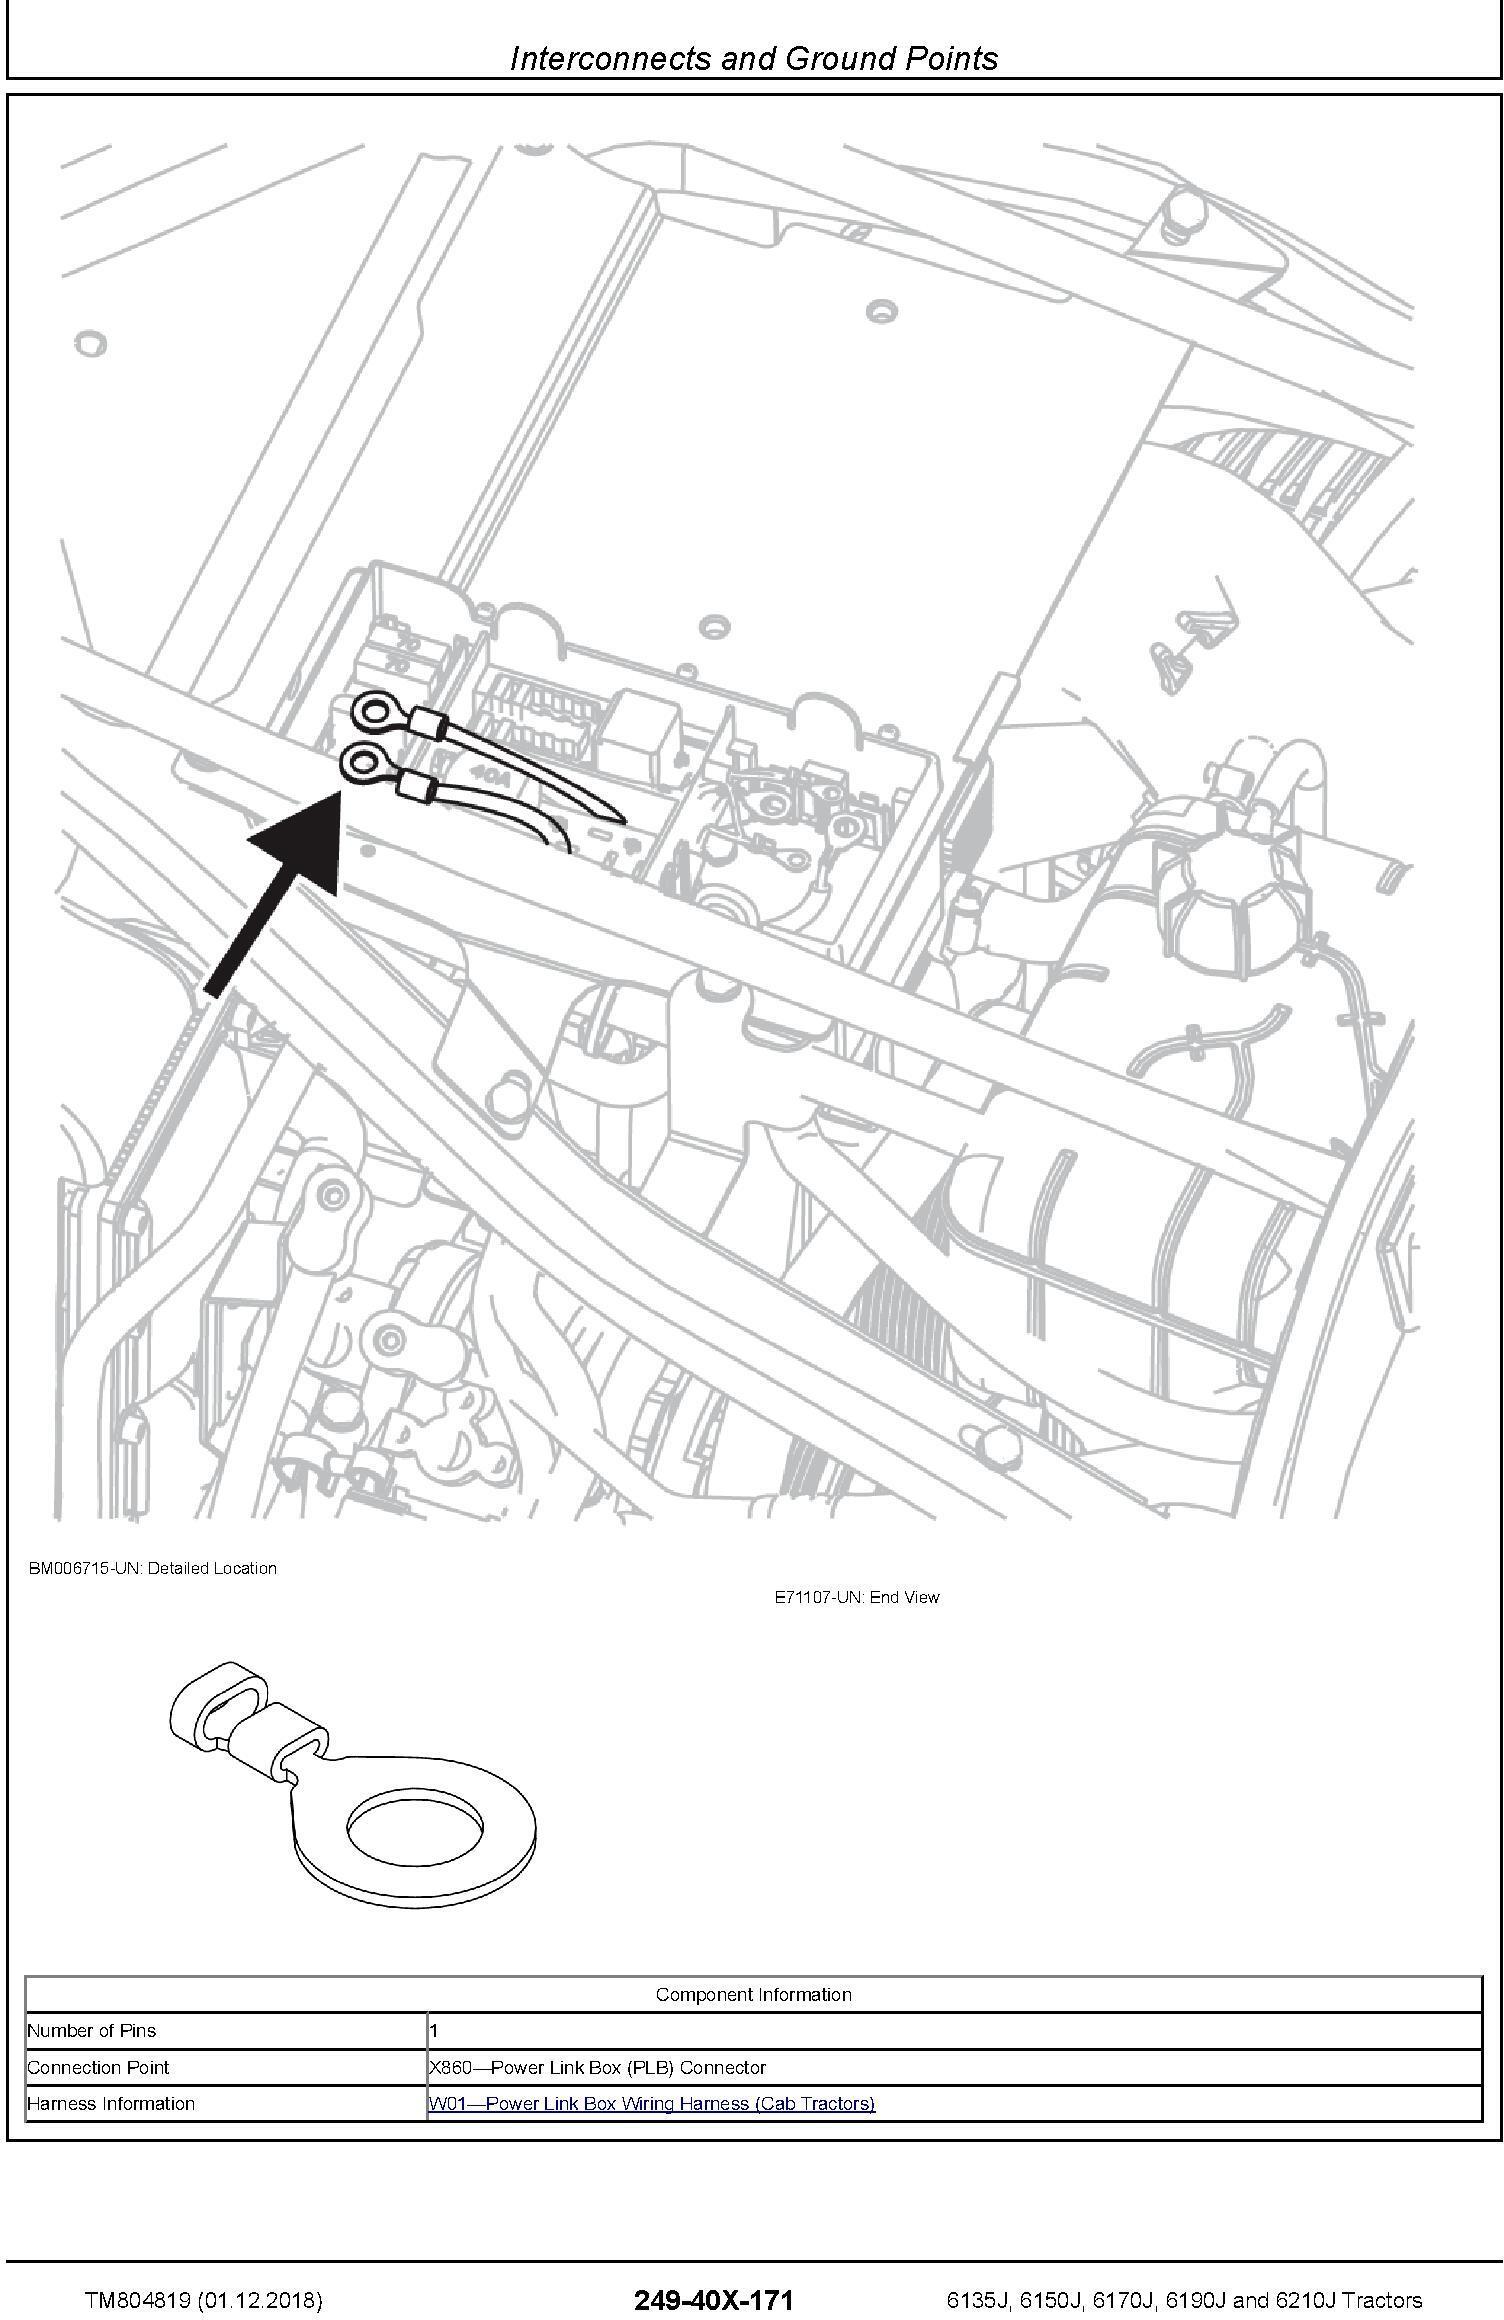 John Deere 6135J, 6150J, 6170J, 6190J, 6210J Tractors Diagnostic Technical Service Manual (TM804819) - 2